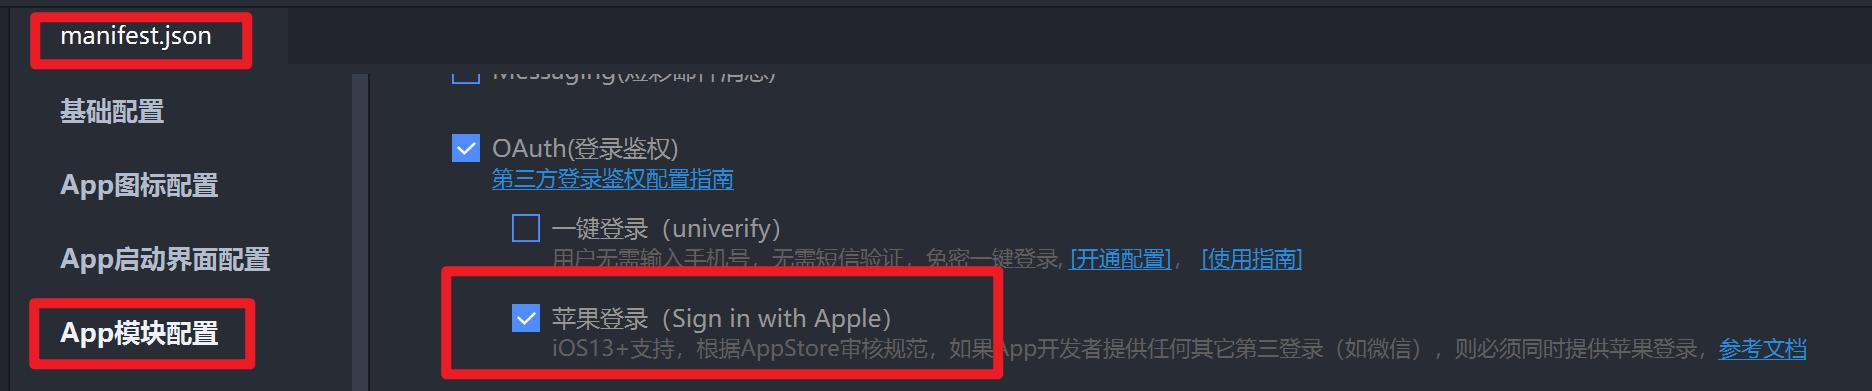 uniapp 苹果授权登录